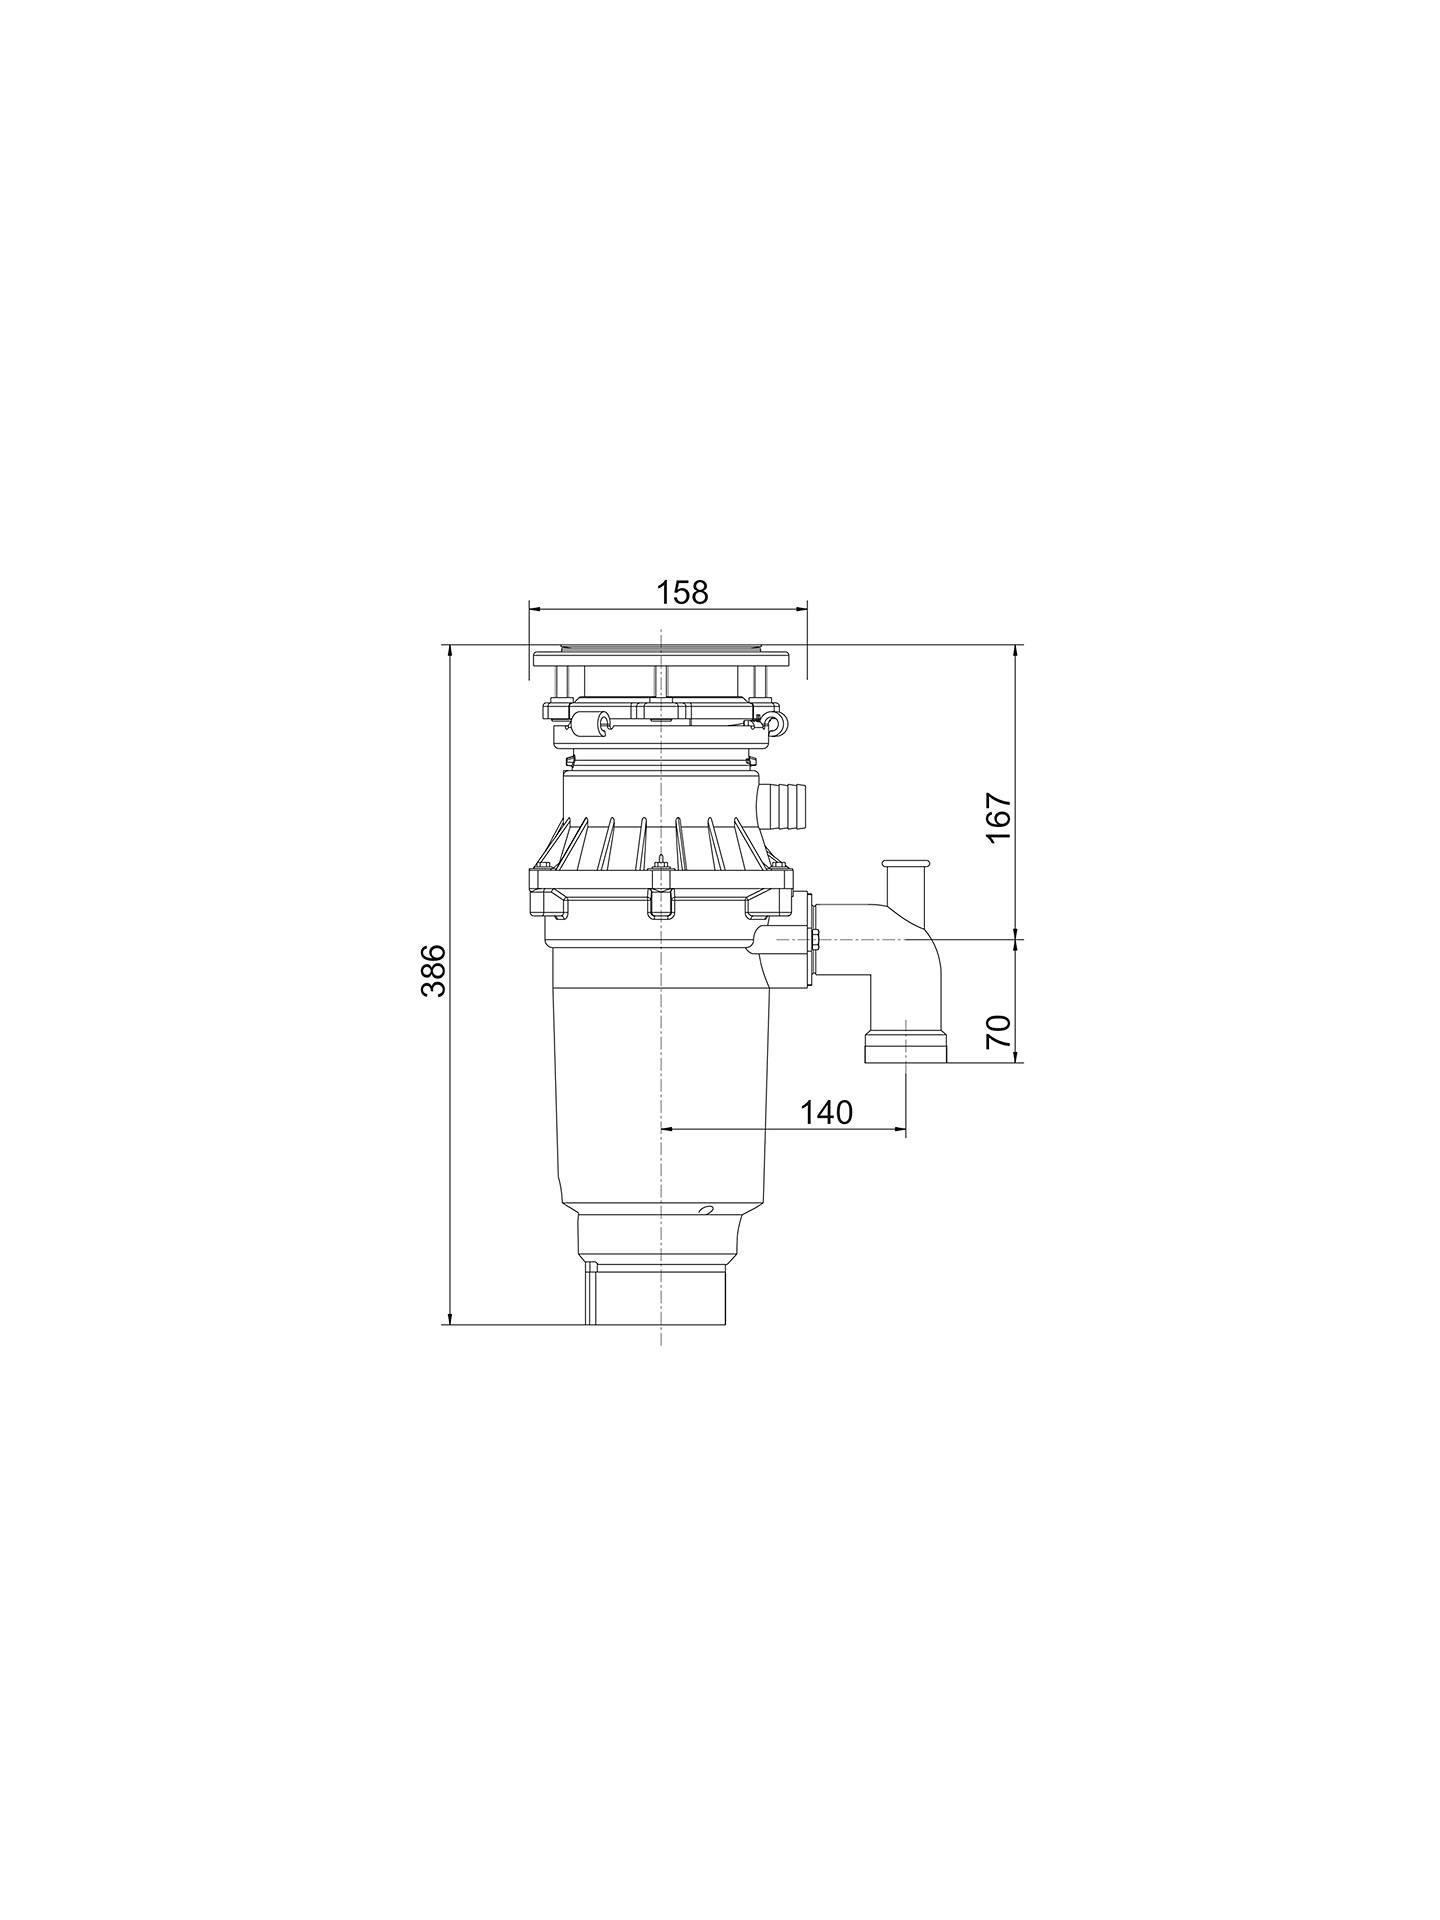 Franke Turbo Elite Te 75s Slimline Waste Disposal Unit At John Lewis Garabage Disopable 3 Way Schematic Wiring Diagram Buyfranke Online